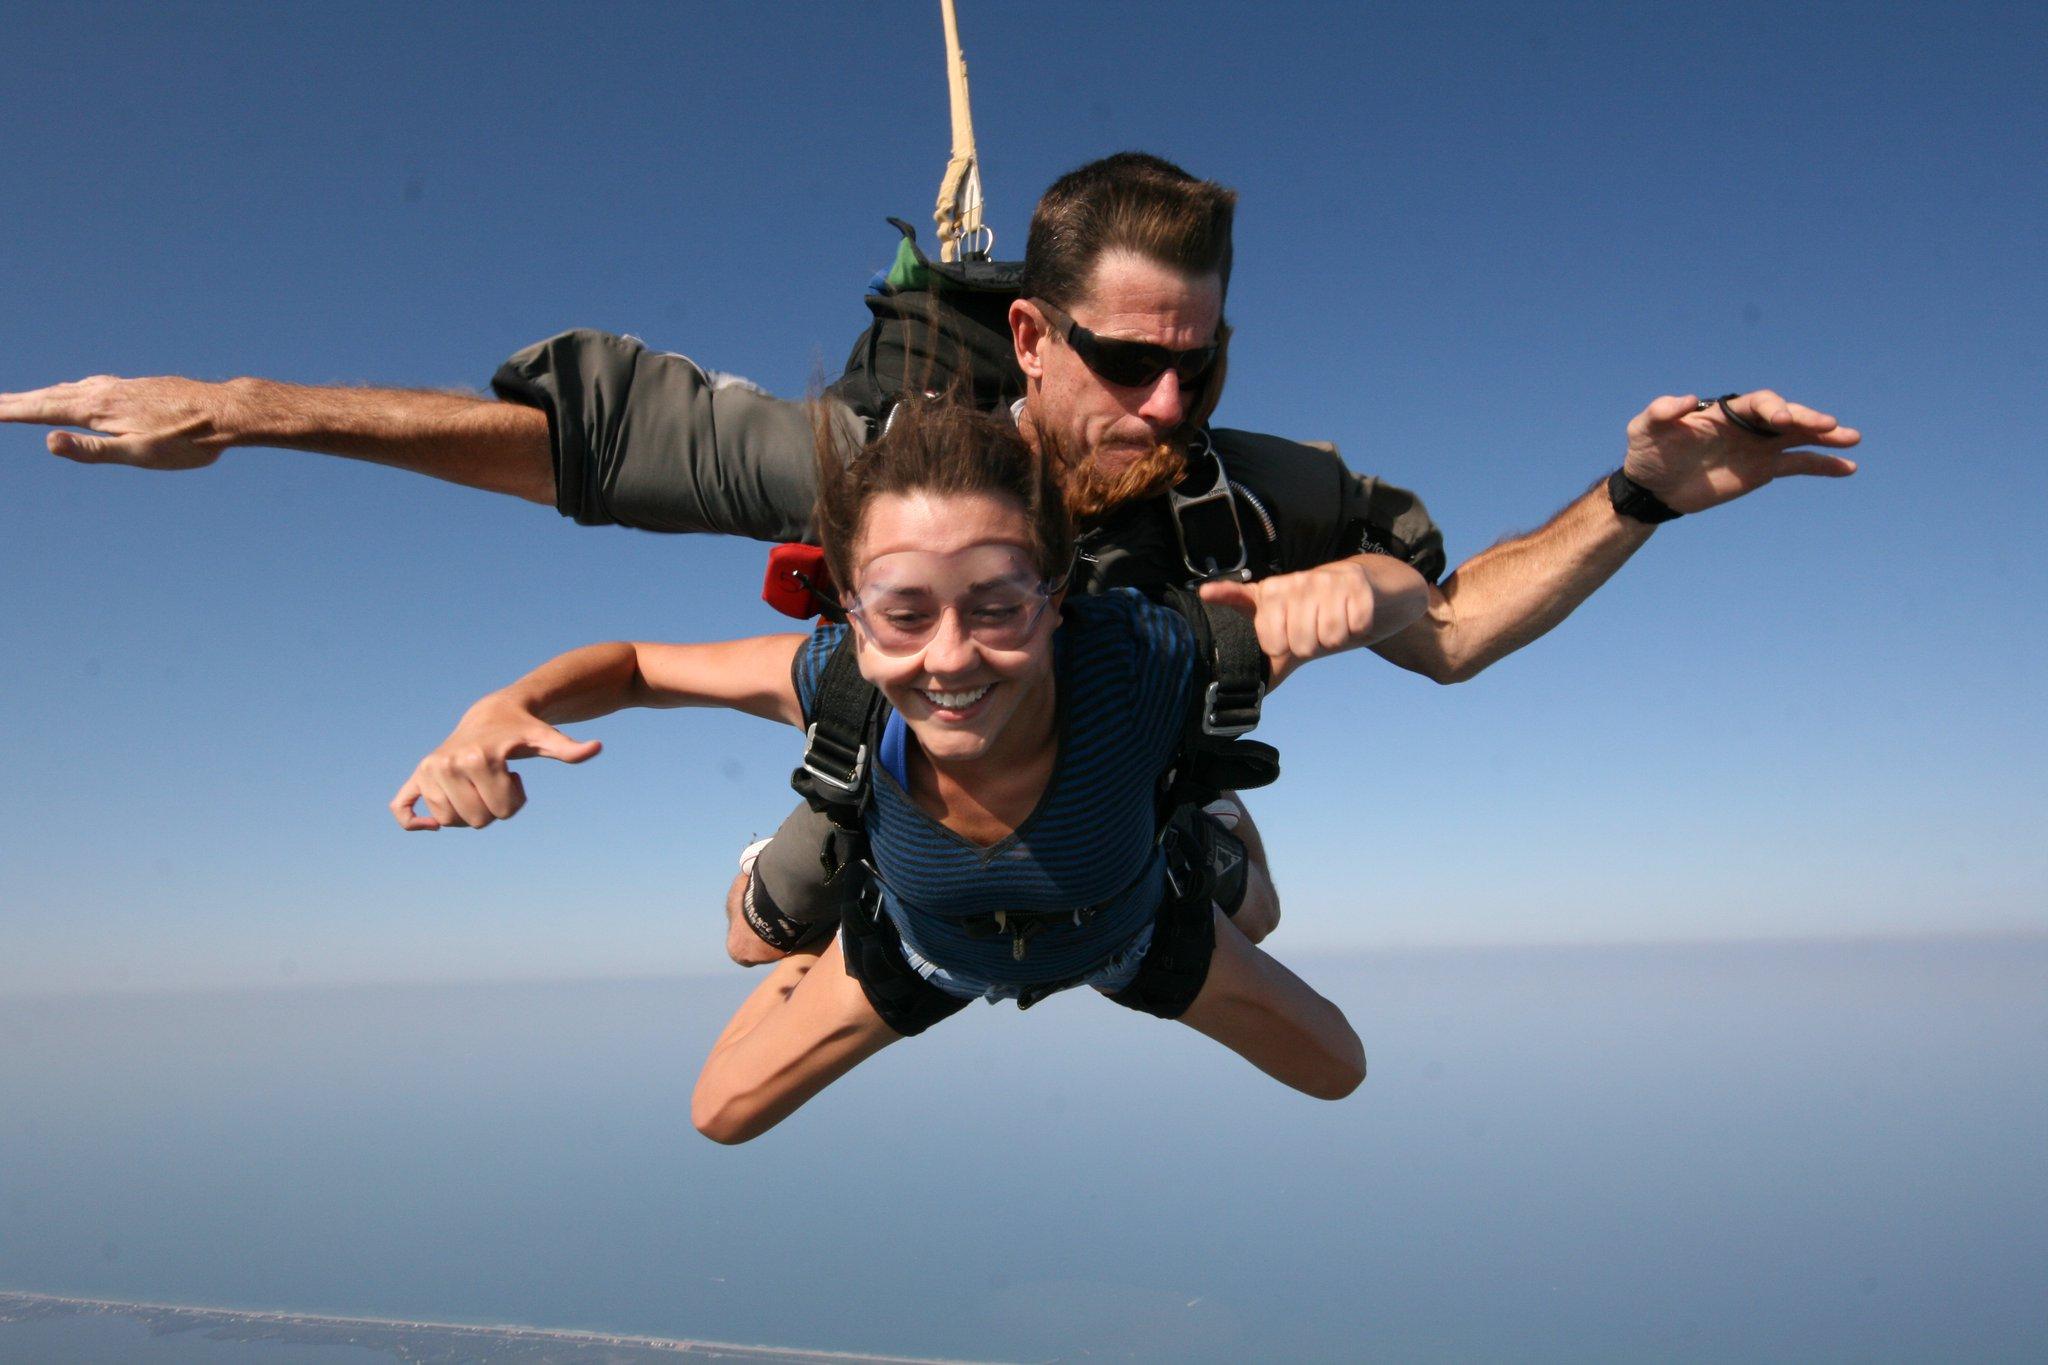 Margarita-Wells-Skydiving